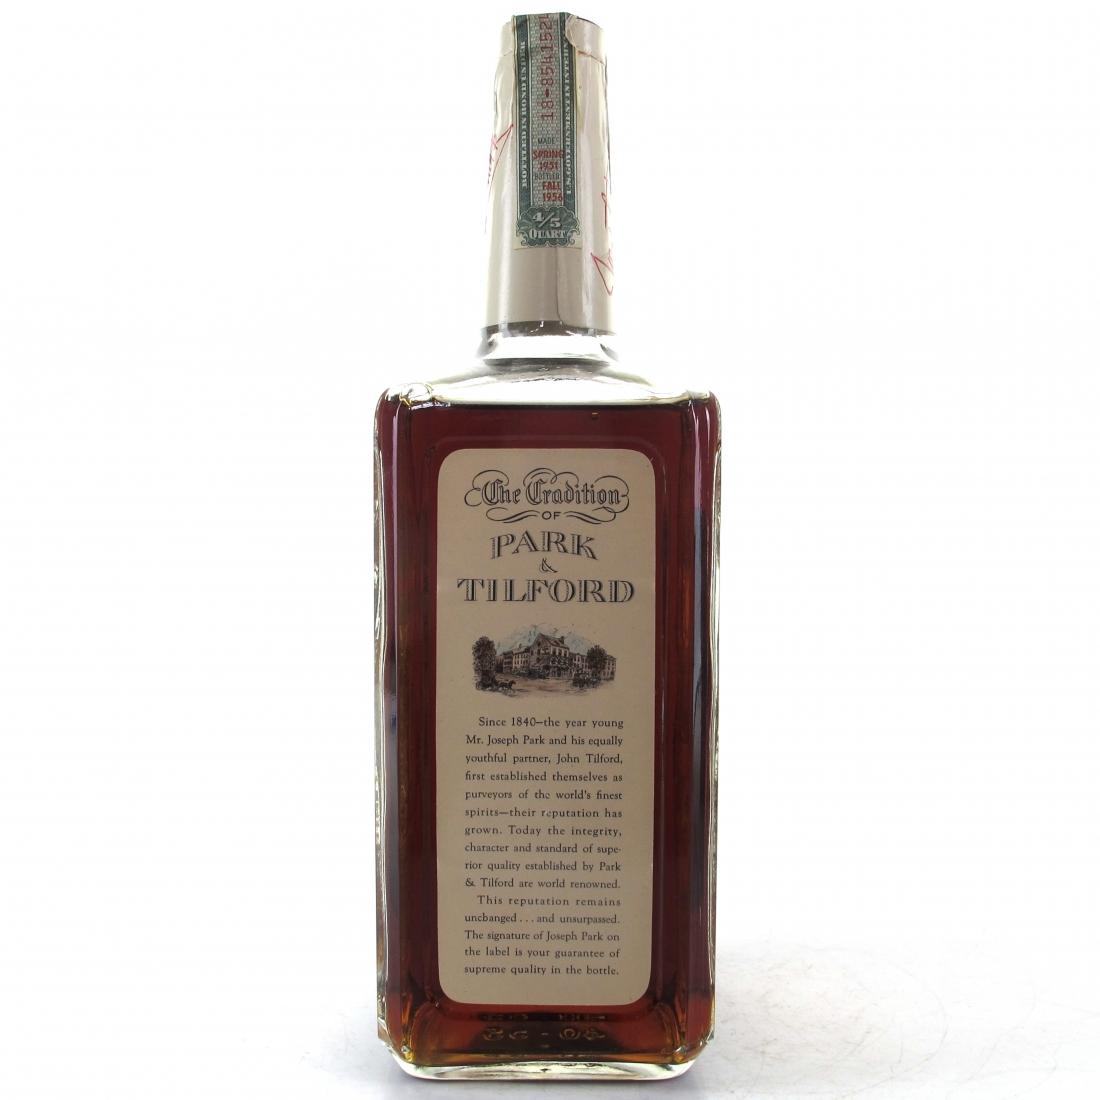 Park and Tilford 1951 'Mr Park' Bottled in Bond 5 Year Old